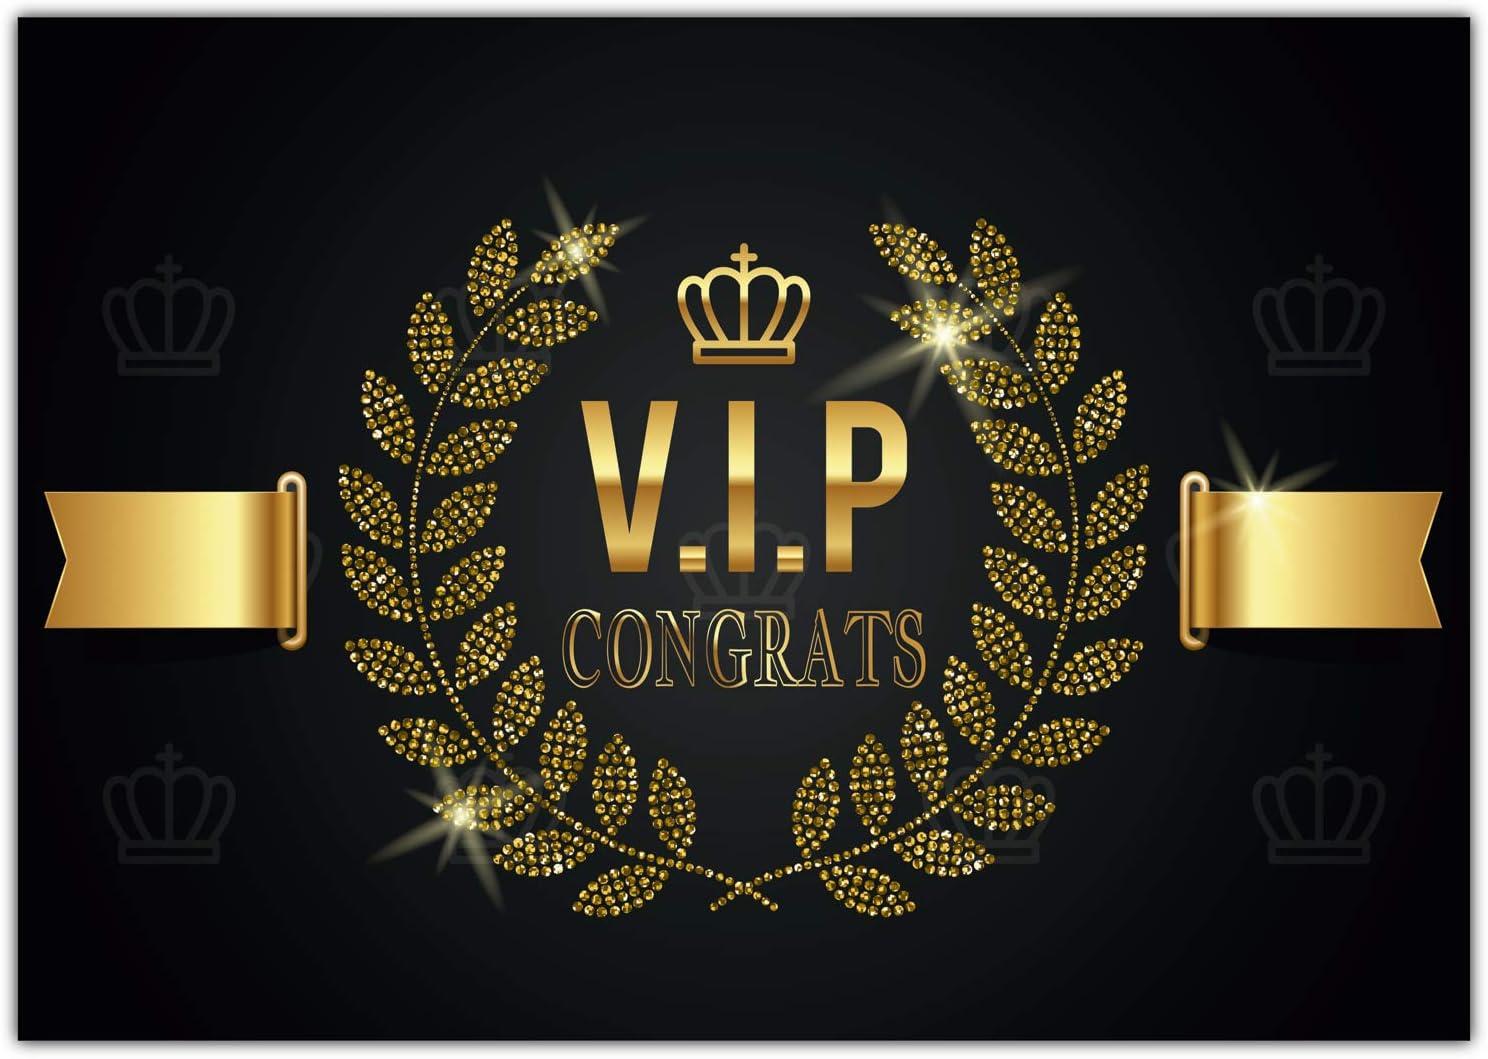 A4 Xxl Greetings Card V I P Weitenwerk Congrats With Envelope Elegant Vip Folding Card For All Occasions Such As Birthday Wedding Anniversary Card Bürobedarf Schreibwaren